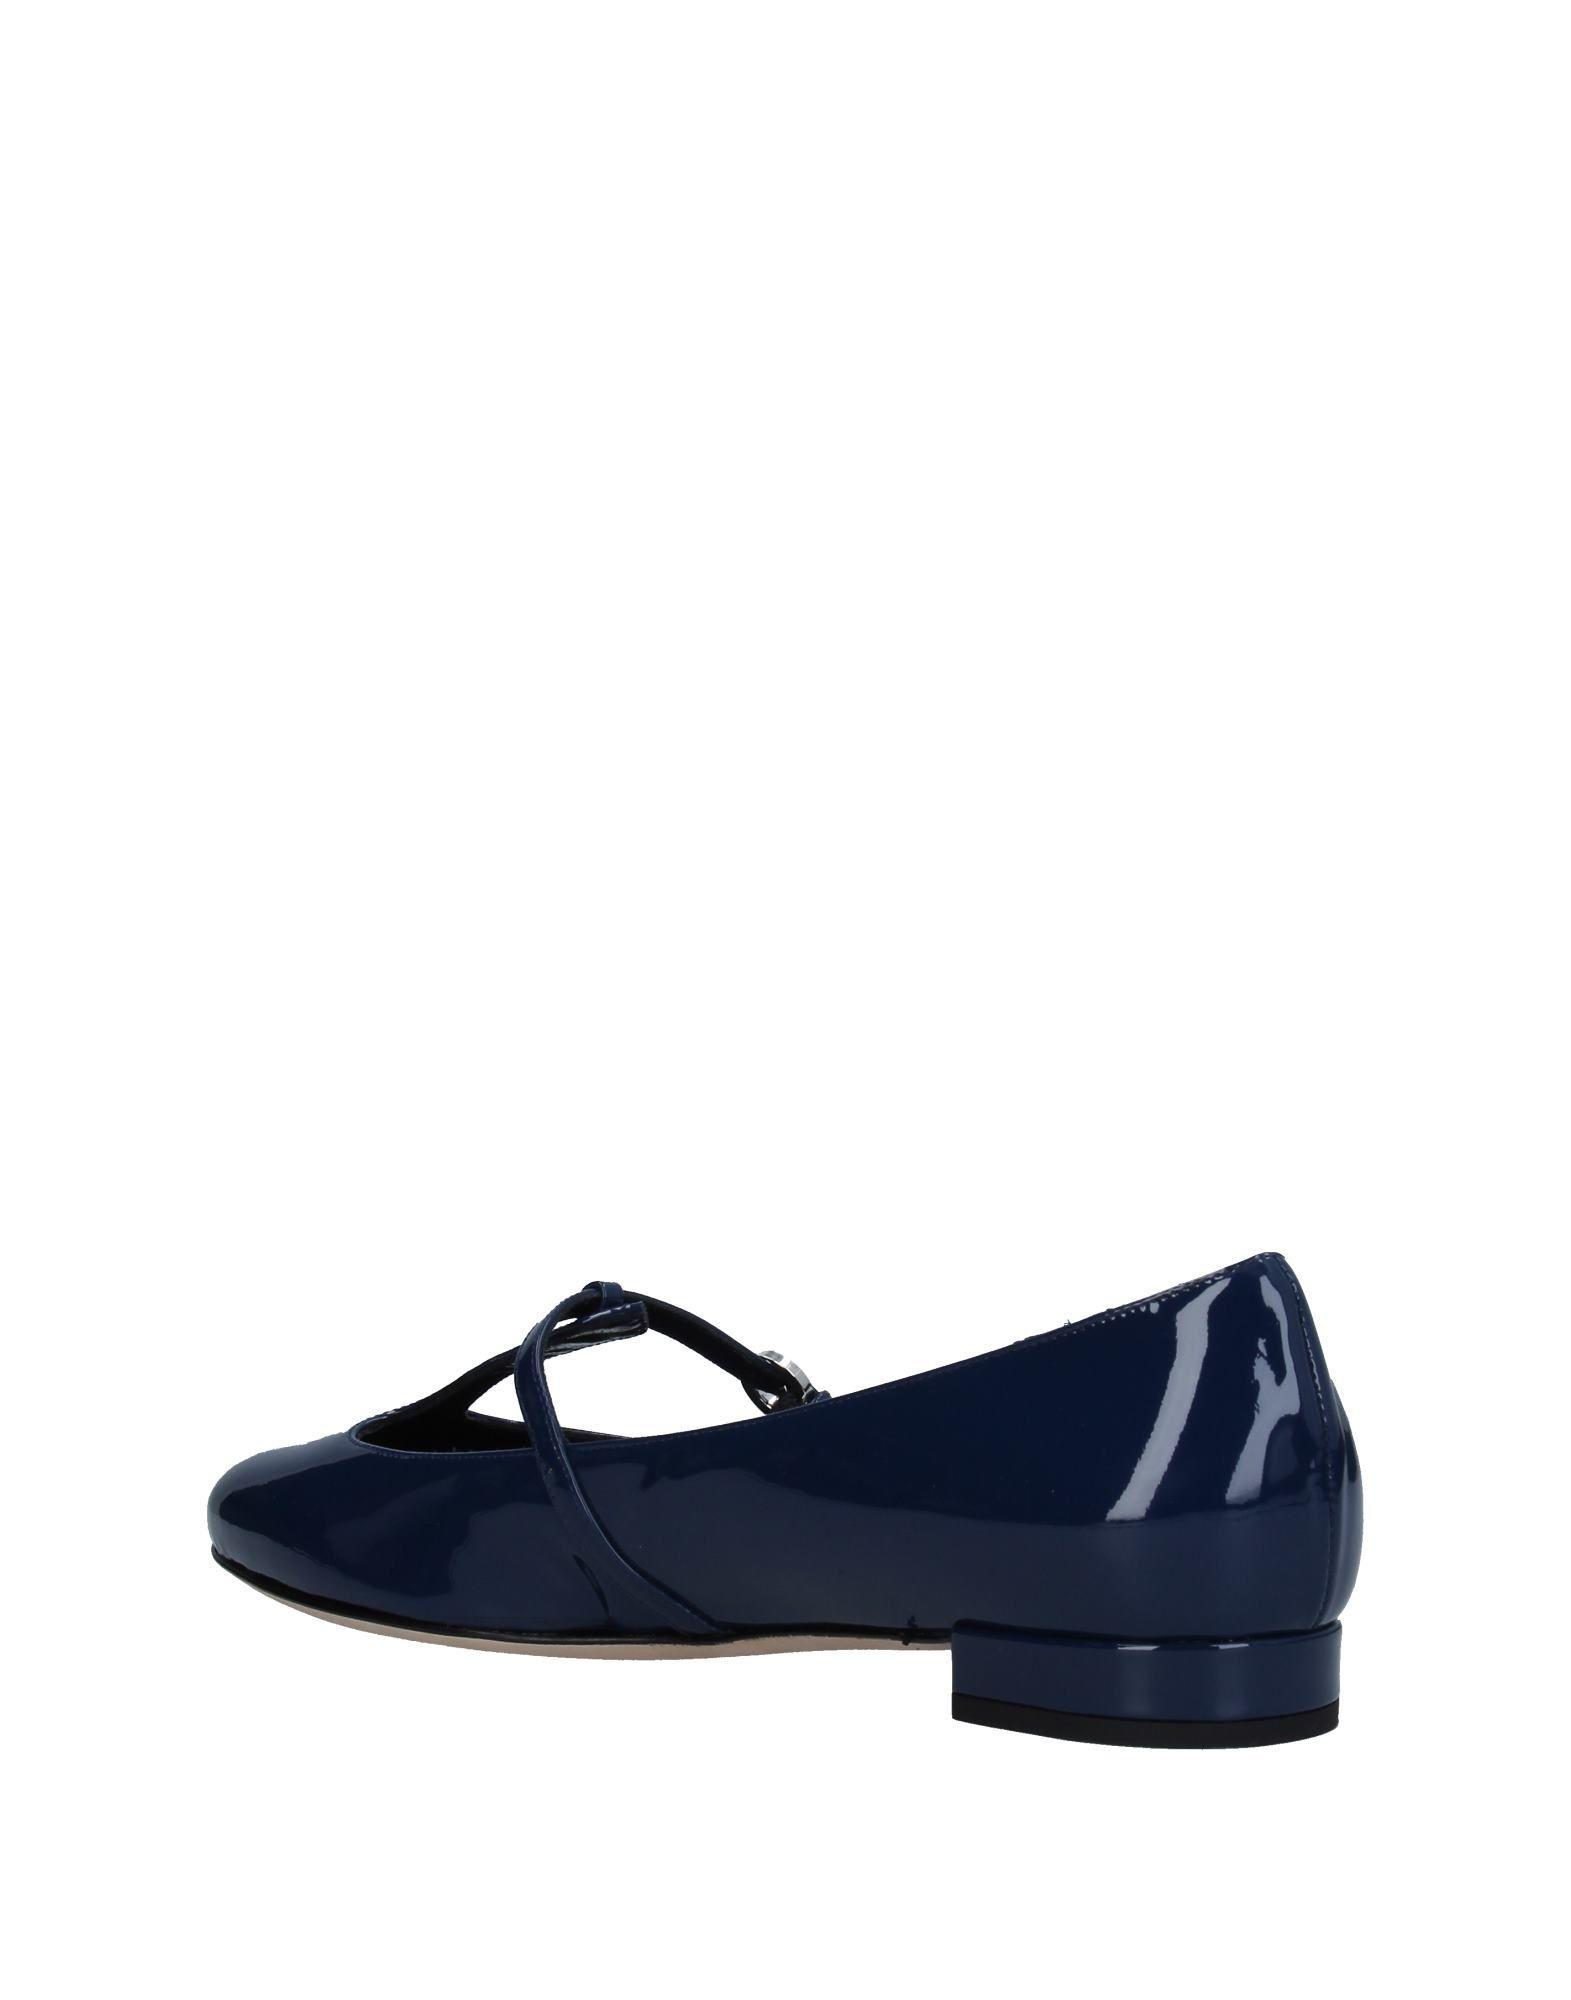 Flats Flats Rodo Lyst Blue Blue Blue in Ballet 8qzOz5fwx